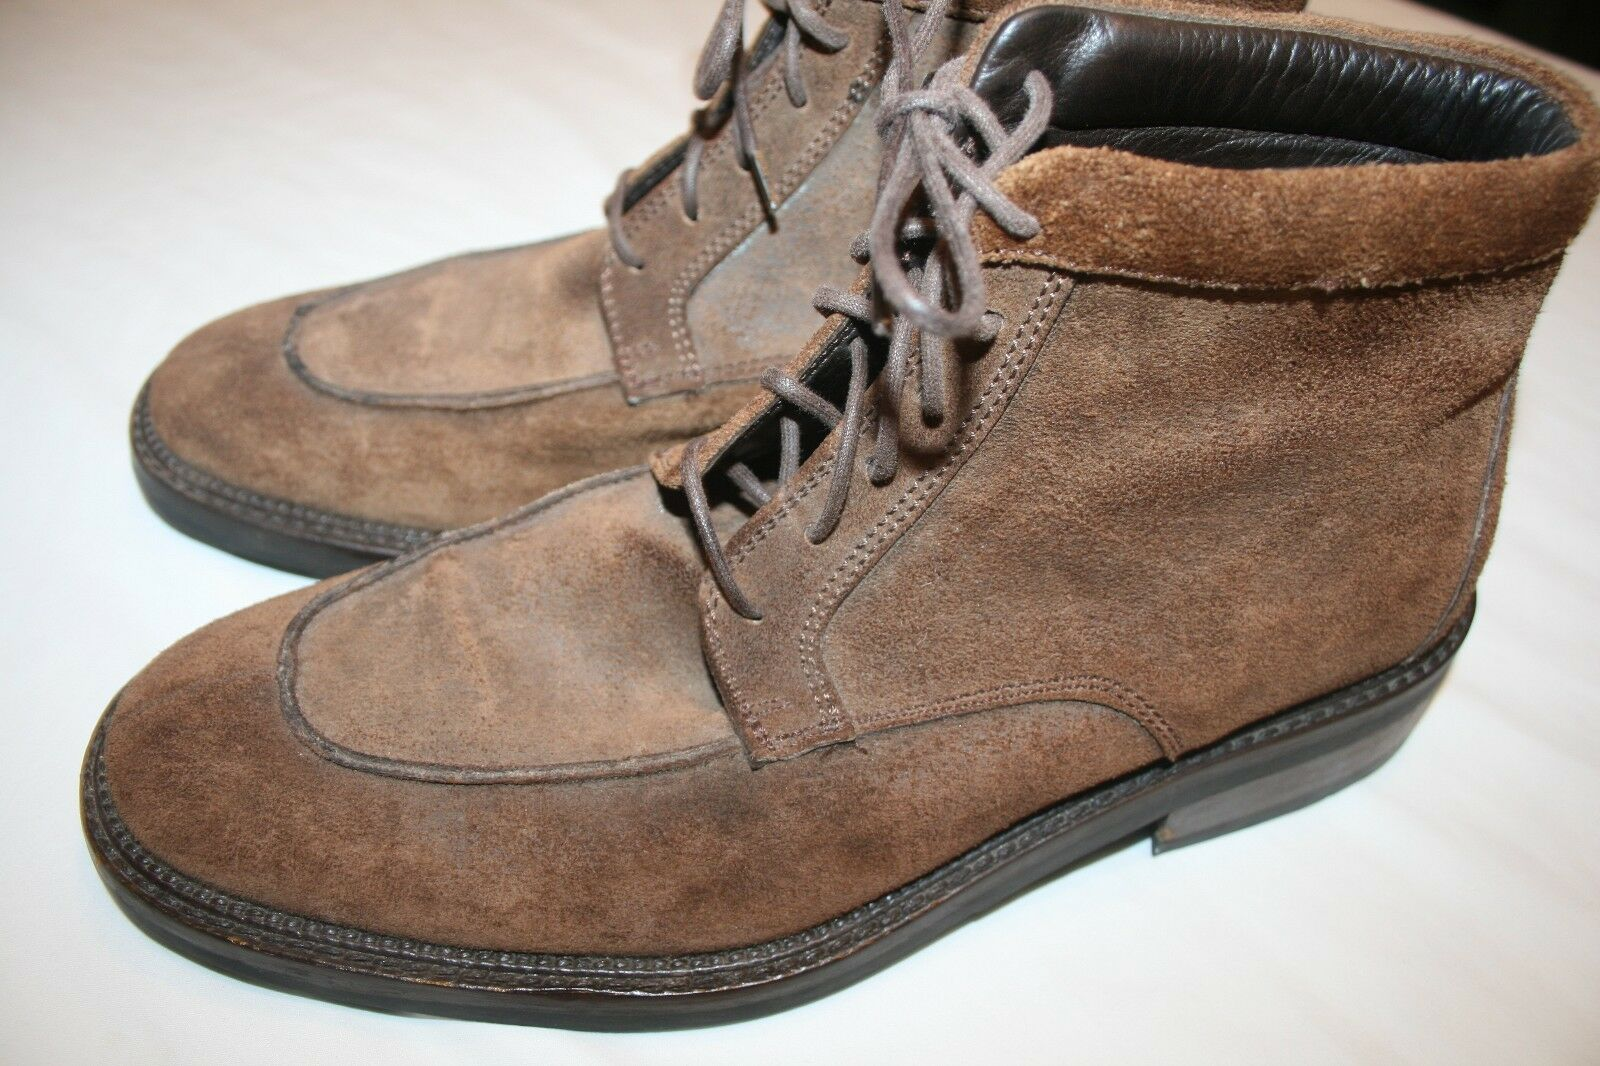 To Boot New York Uomo Brown Suede Stivali Stivali Suede 8.5 Italy Made EUC ebc05d